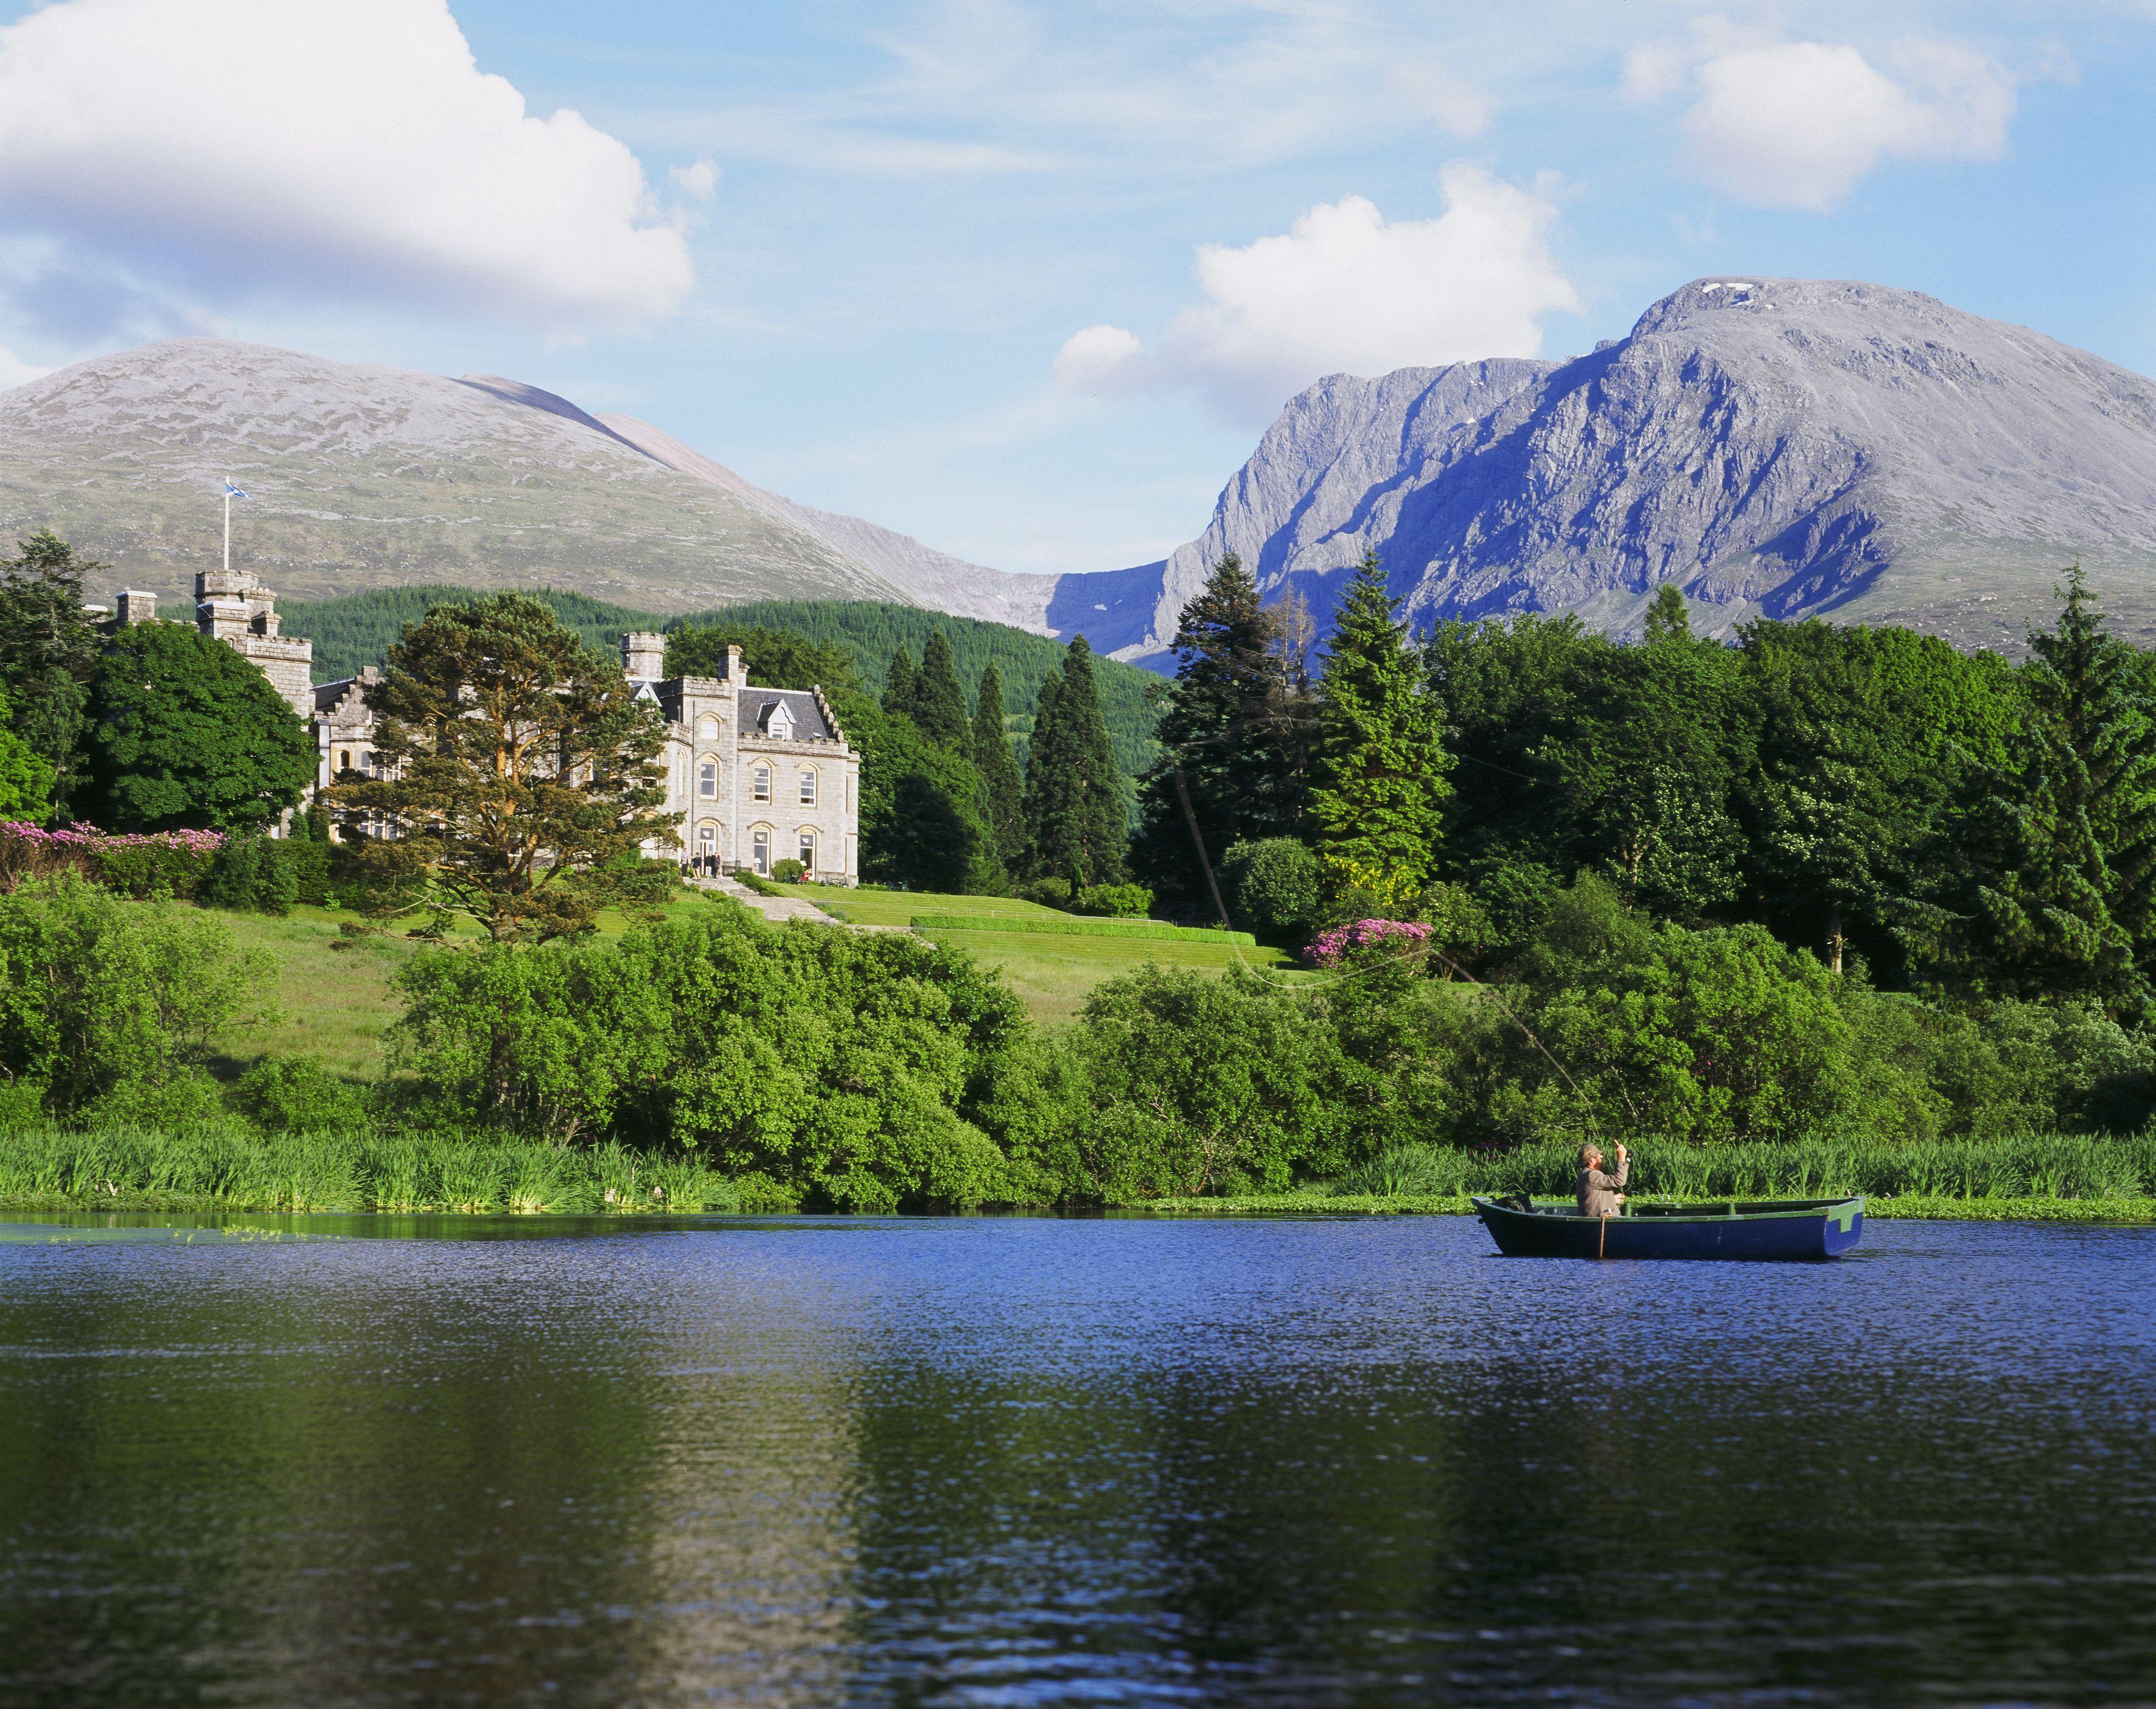 Courtesy of Inverlochy Castle Hotel / Expedia